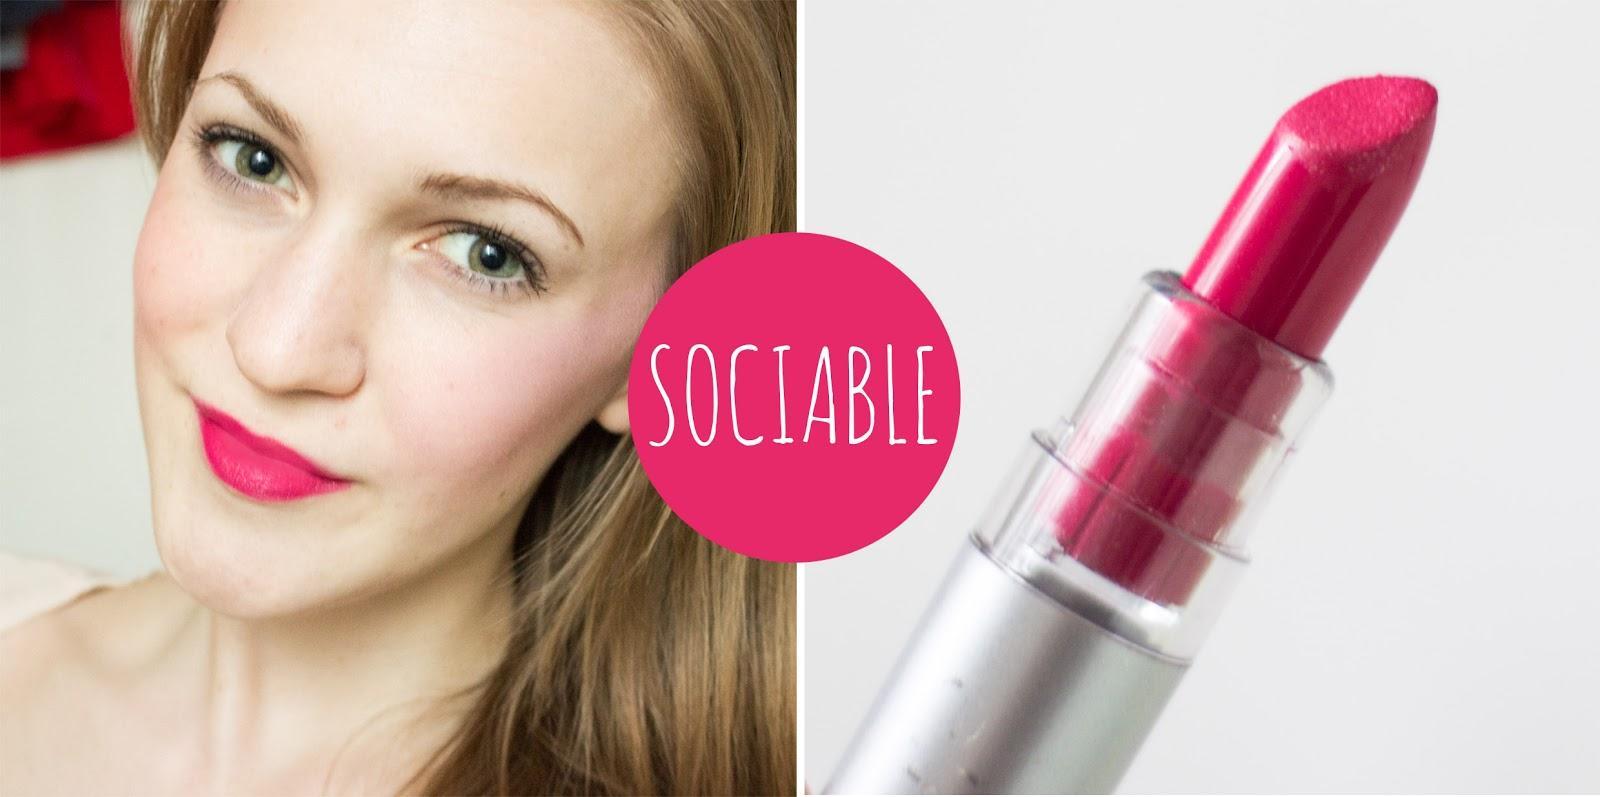 E.l.f. Lipstick Swatches - Paperblog